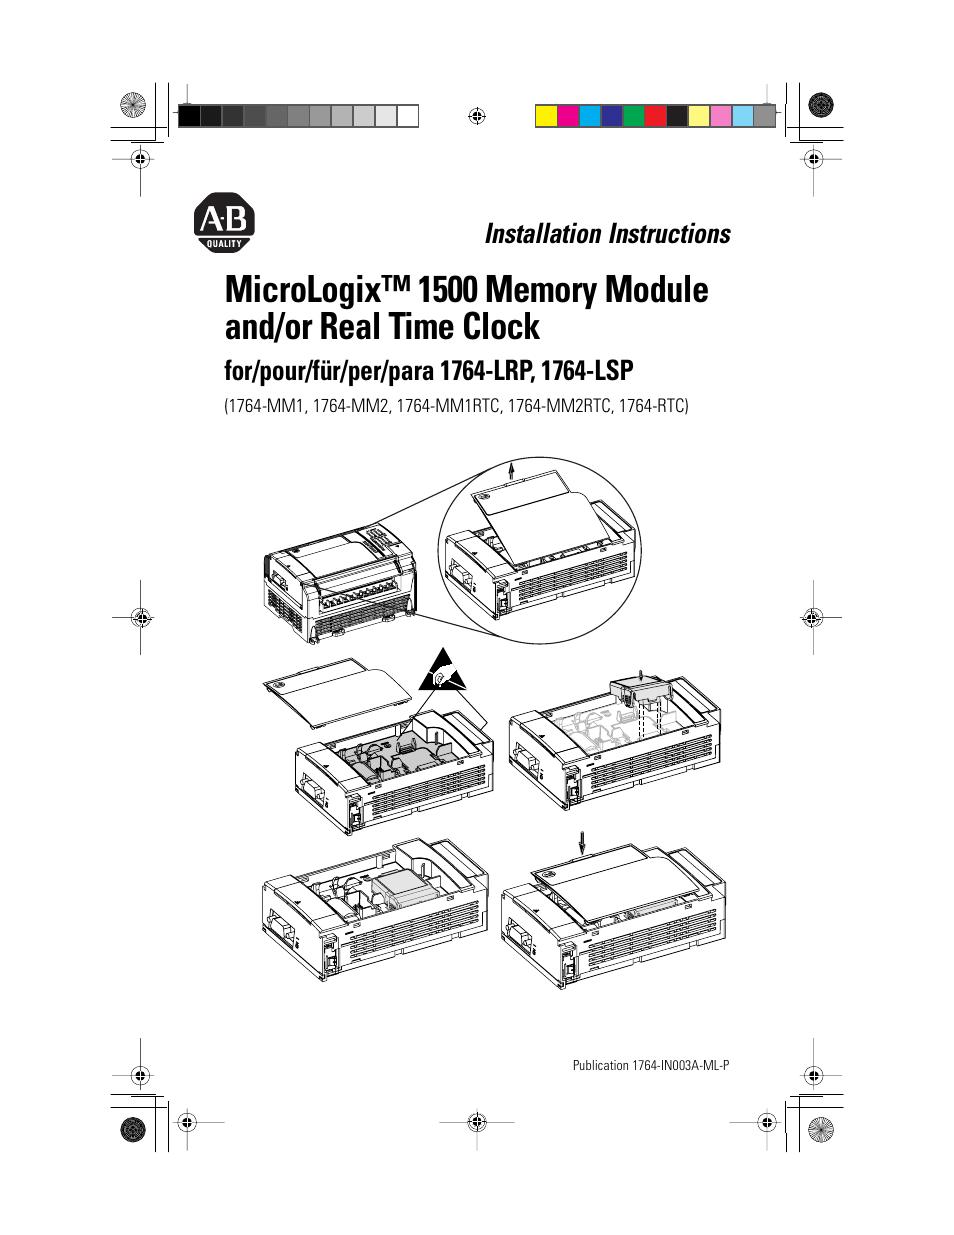 Rockwell Automation 1764-RTC MicroLogix 1500 Memory Module